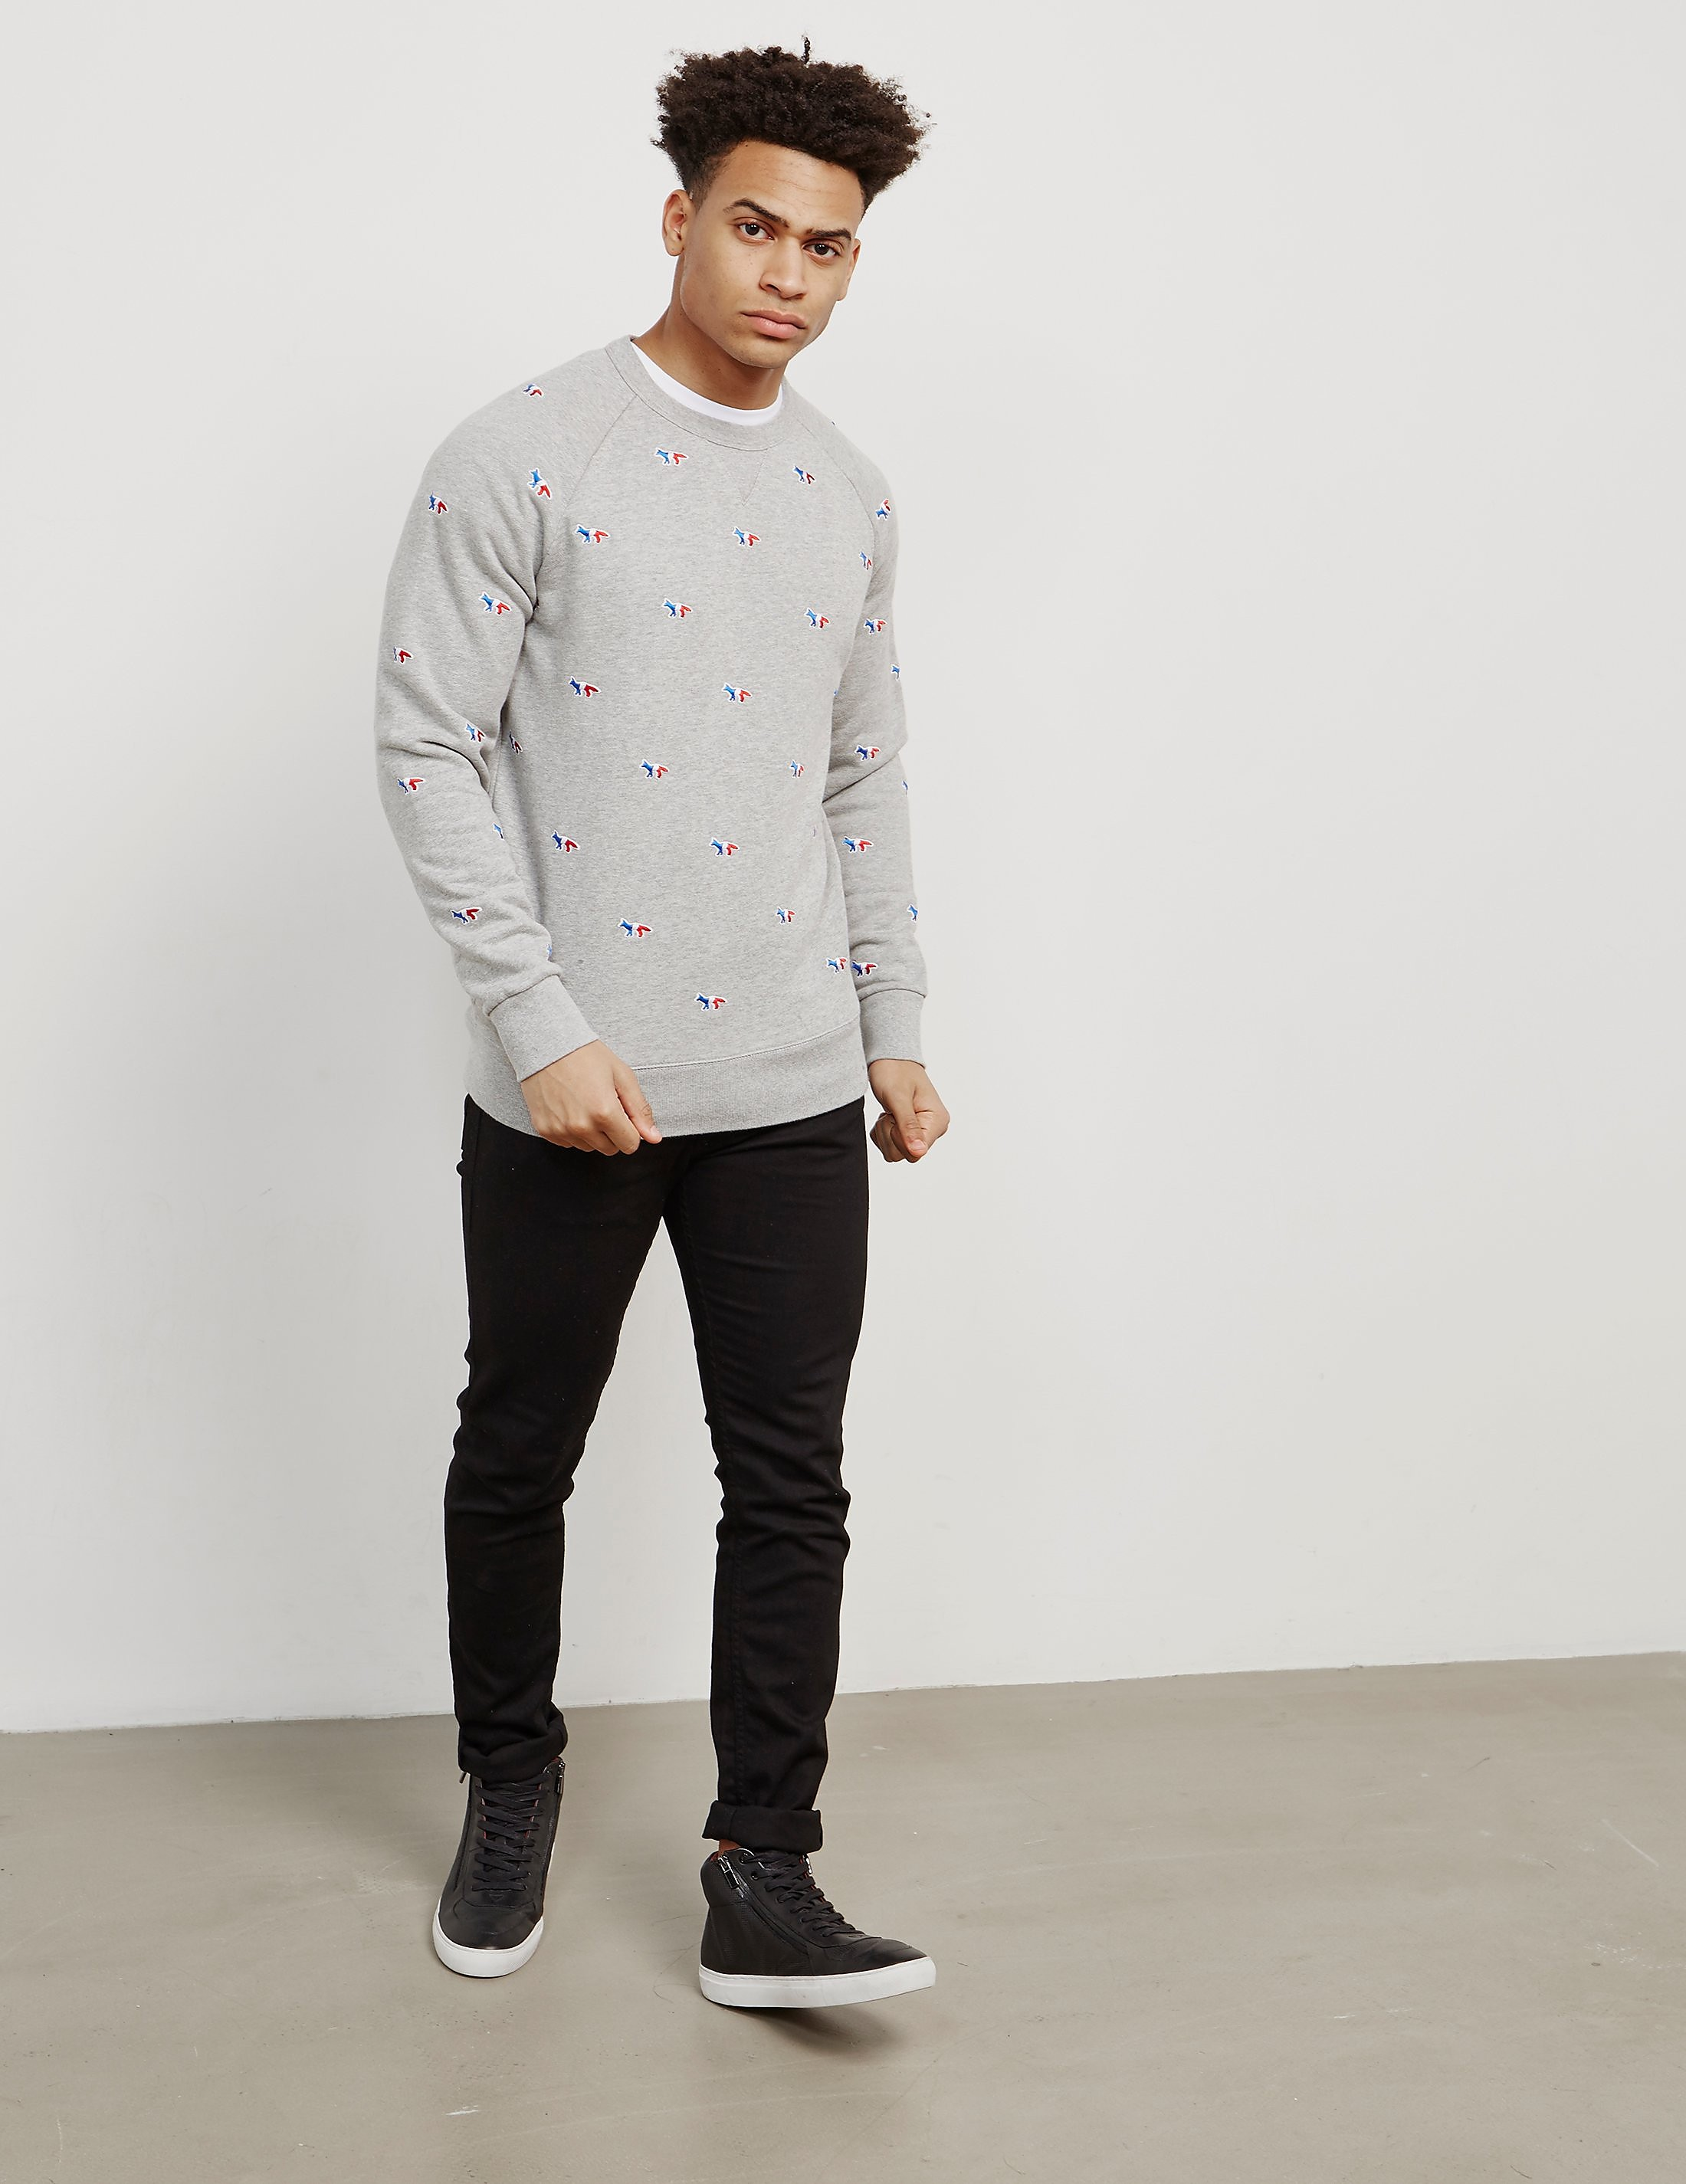 Maison Kitsune All Over Print Fox Sweatshirt